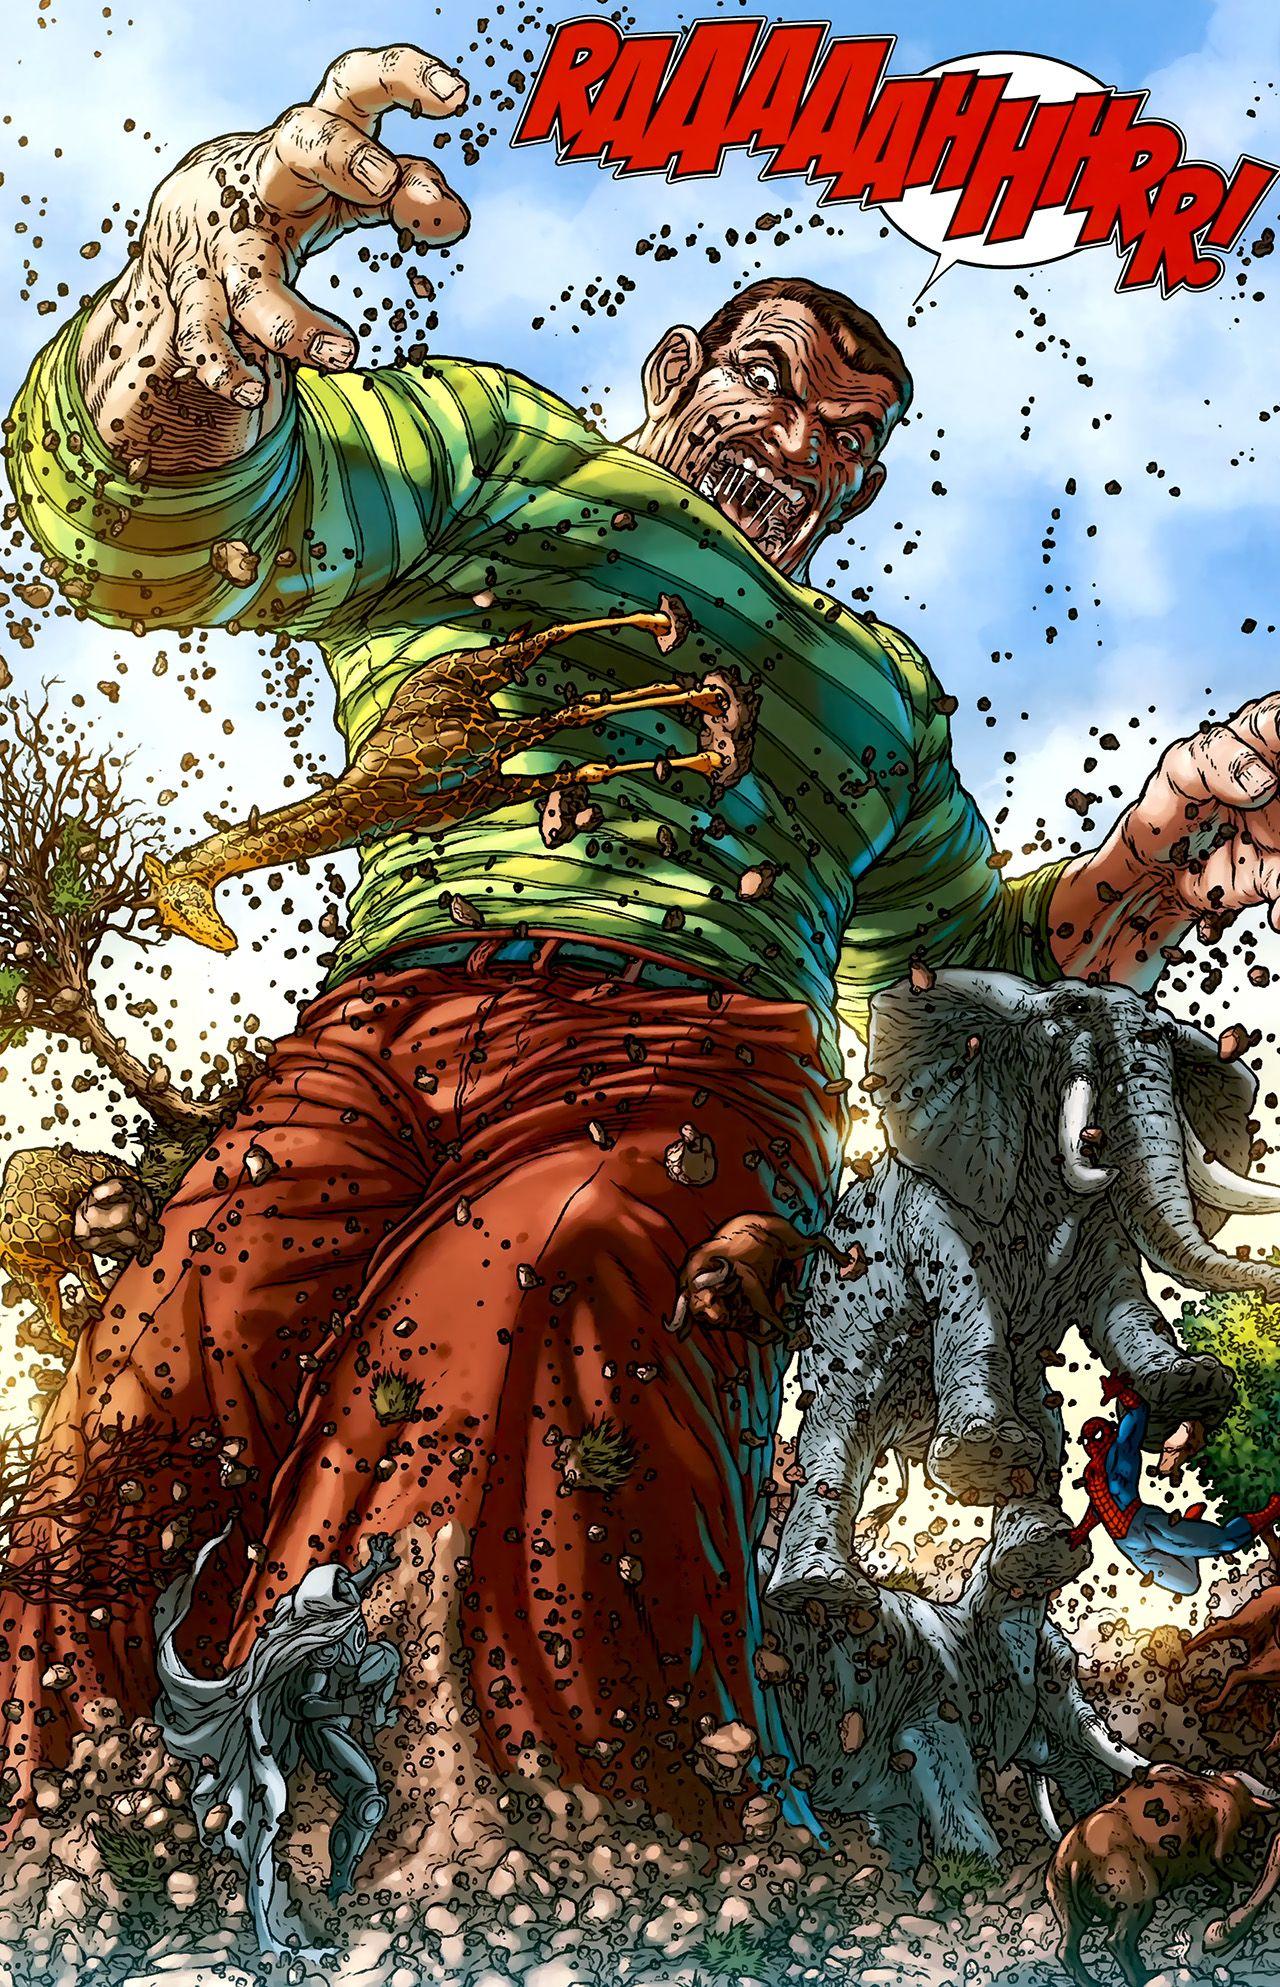 Spiderman VS Sandman | Spiderman, Sandman, Comic books